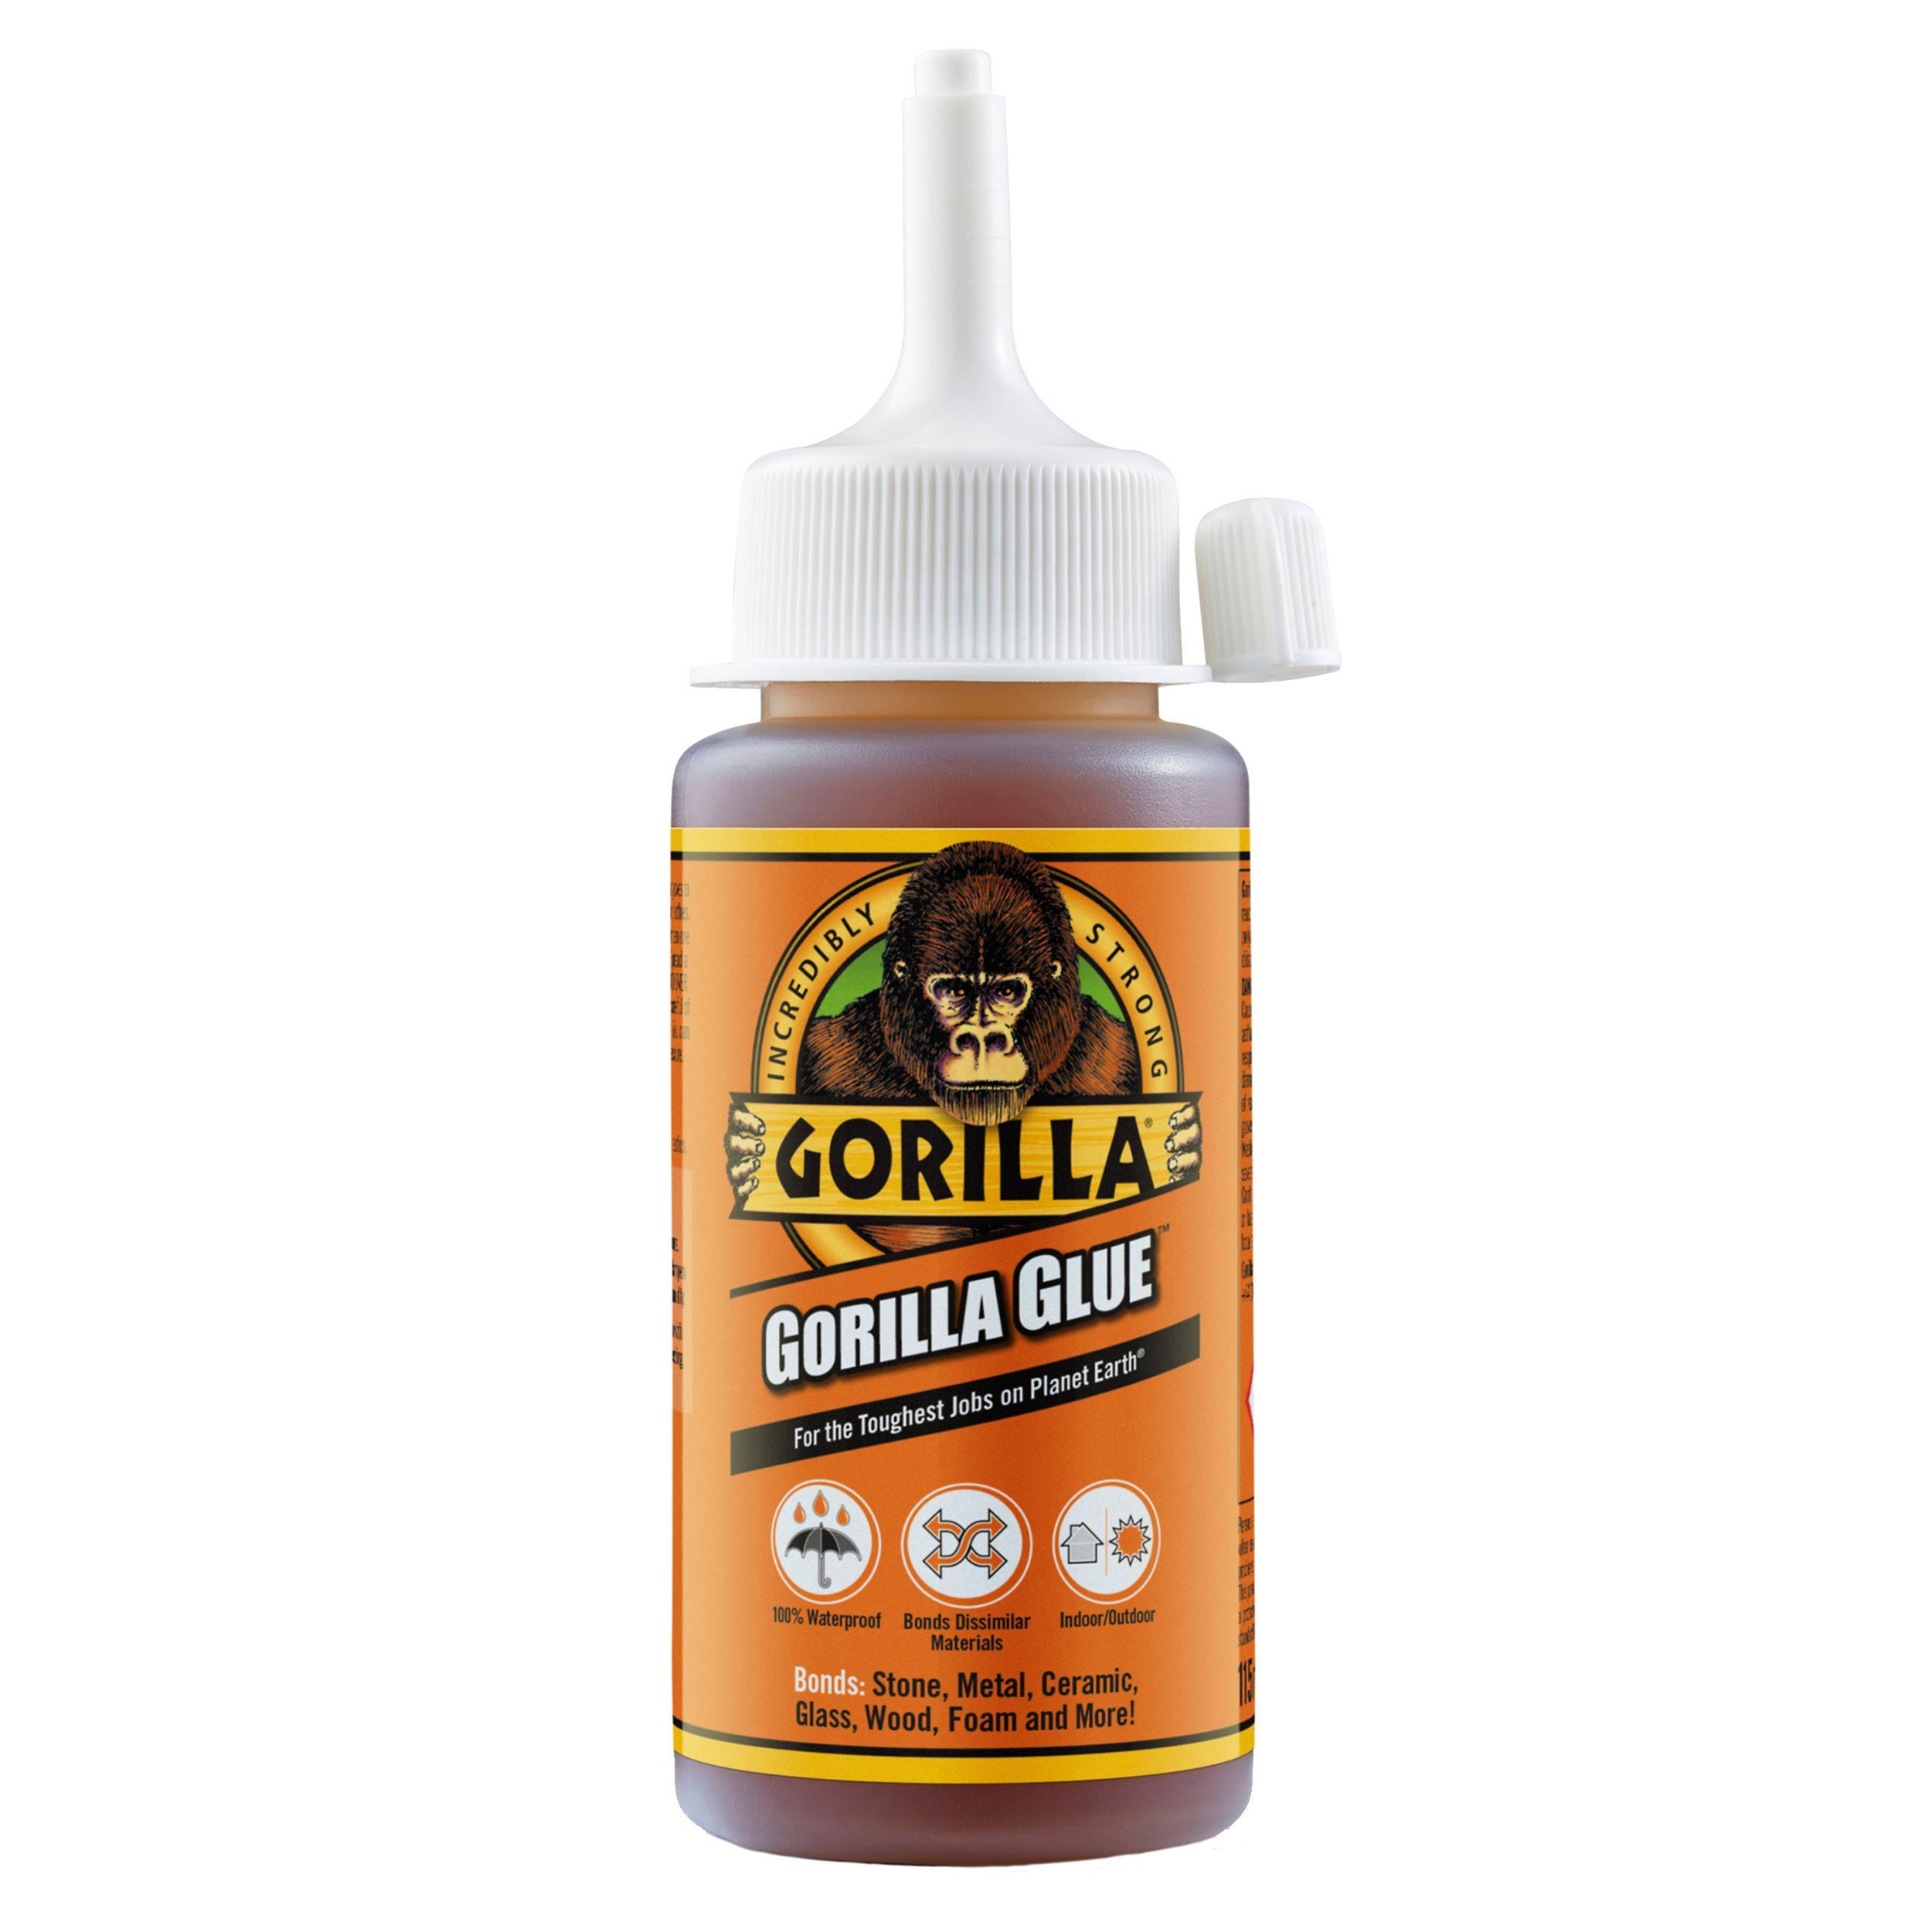 Gorilla Glue 115ml | Departments | DIY at B&Q